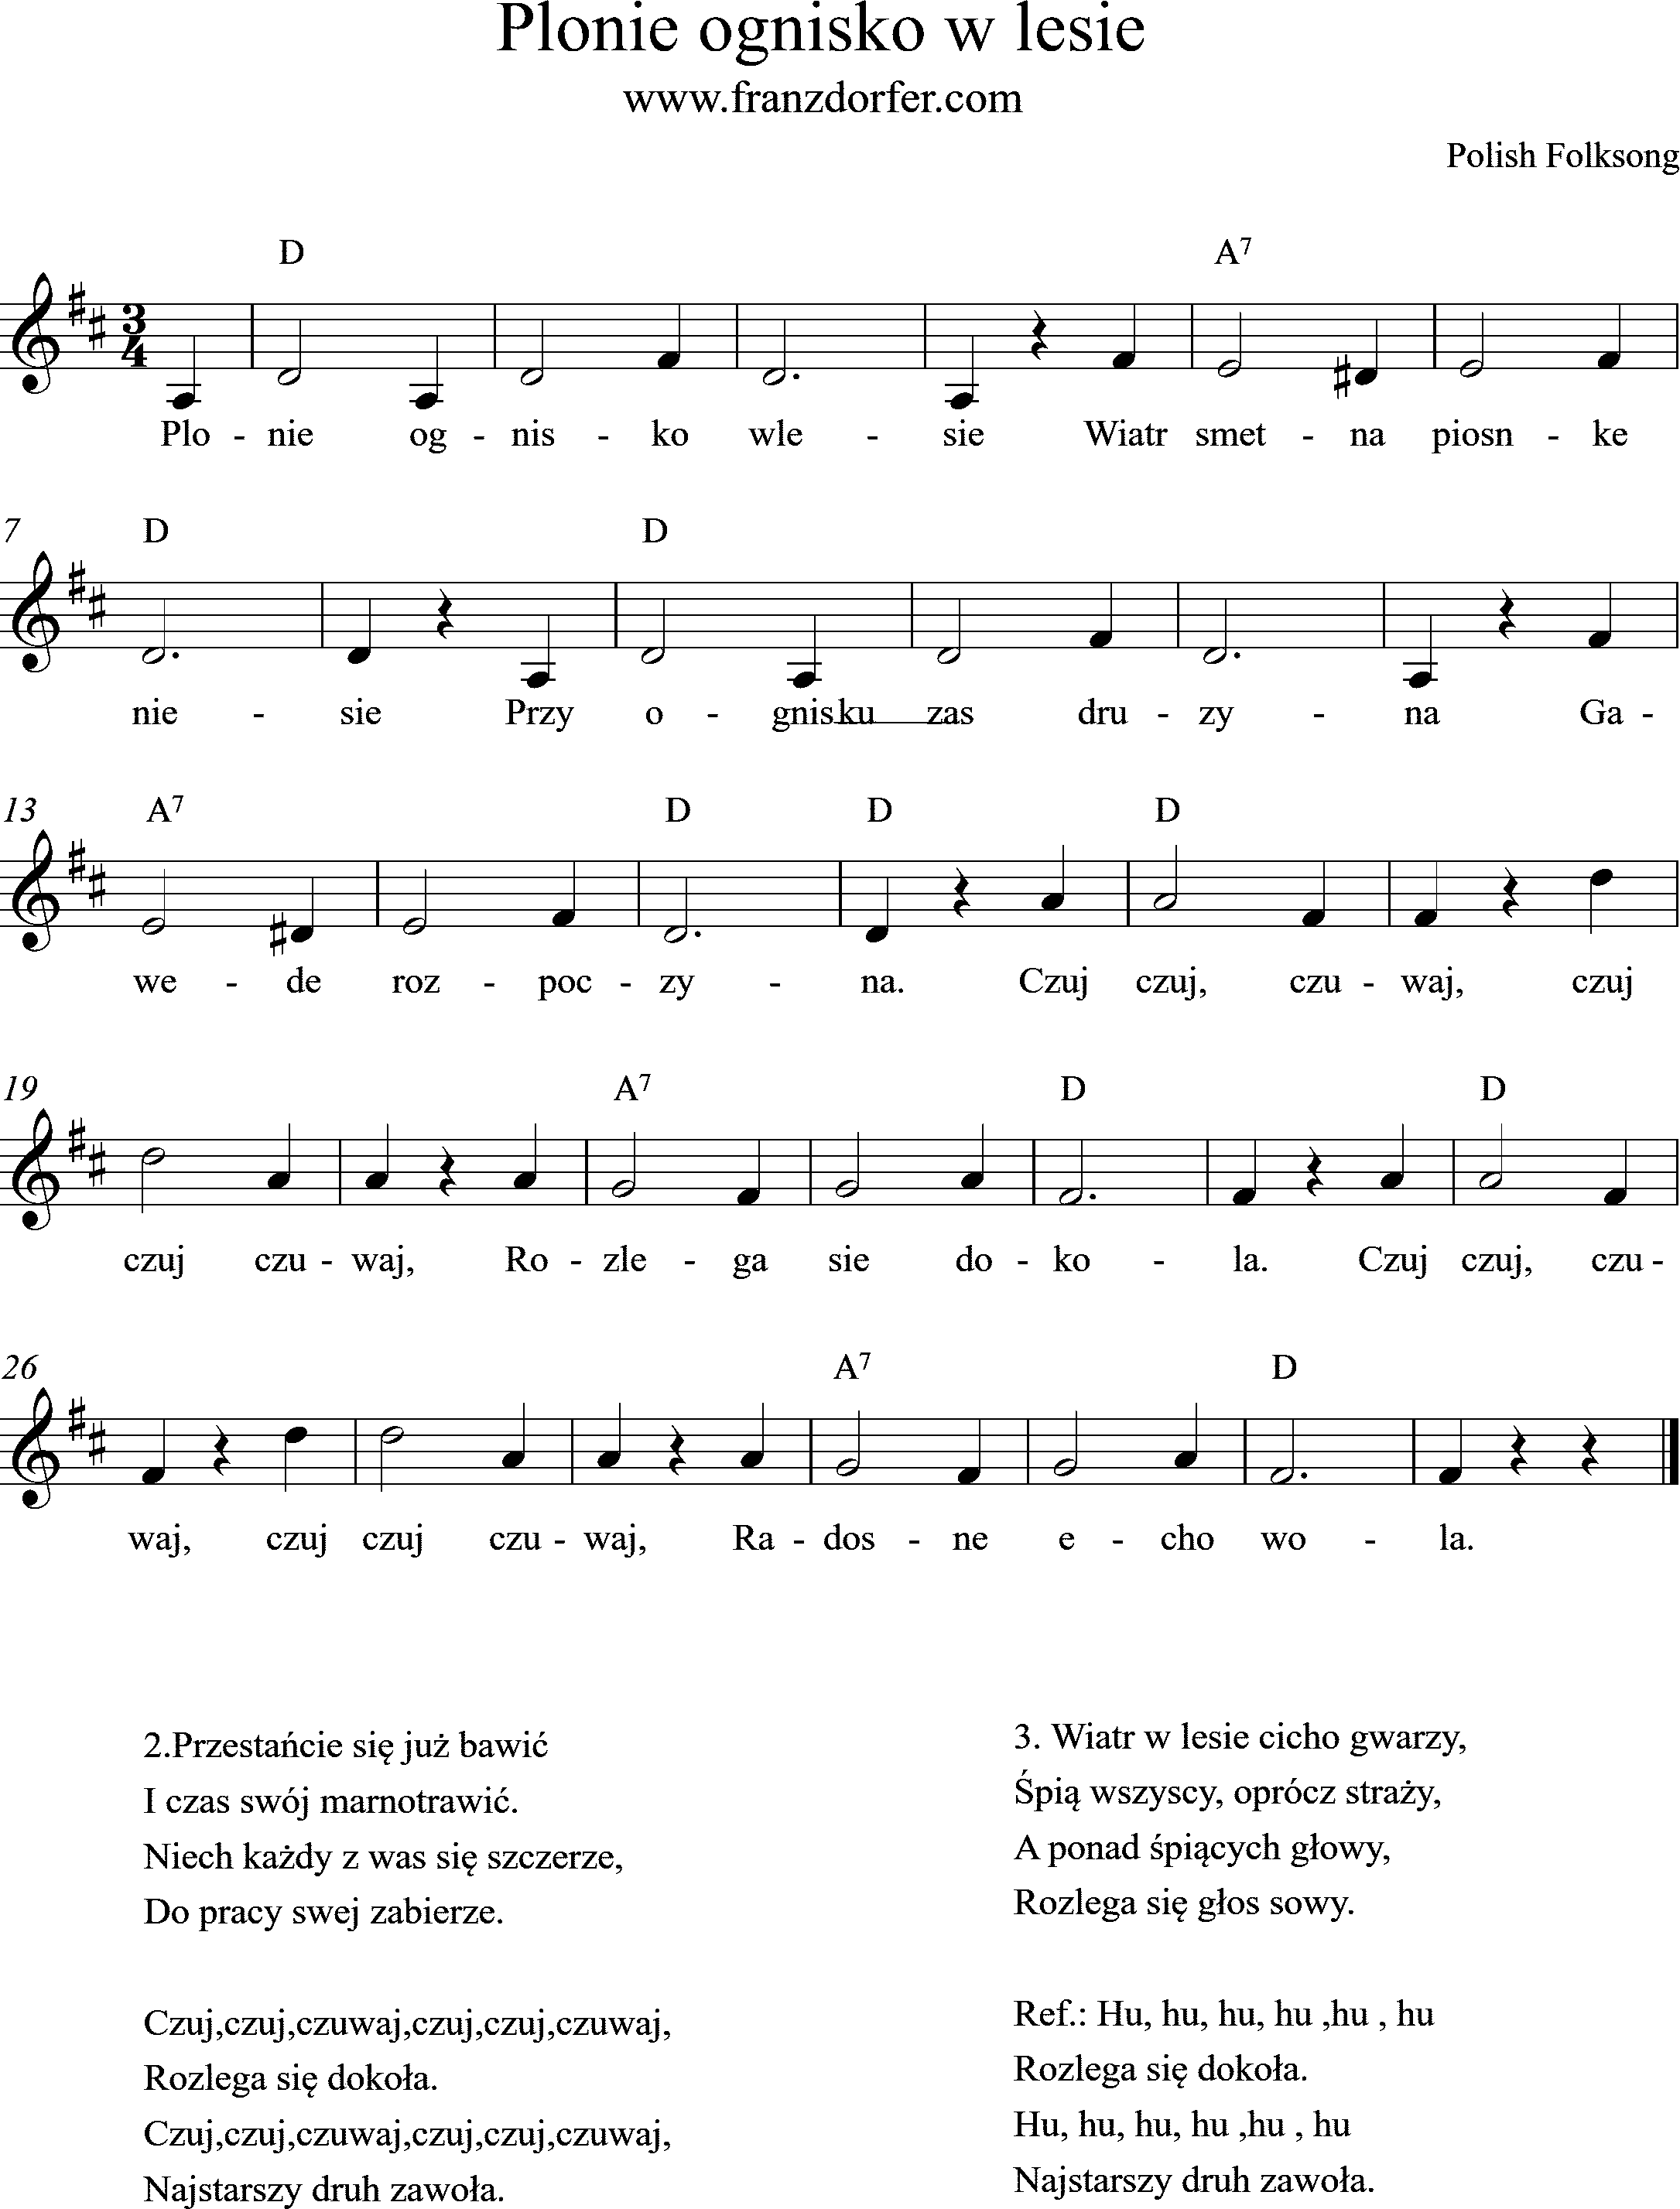 sheetmusic, D-Major, Plonie ognisko